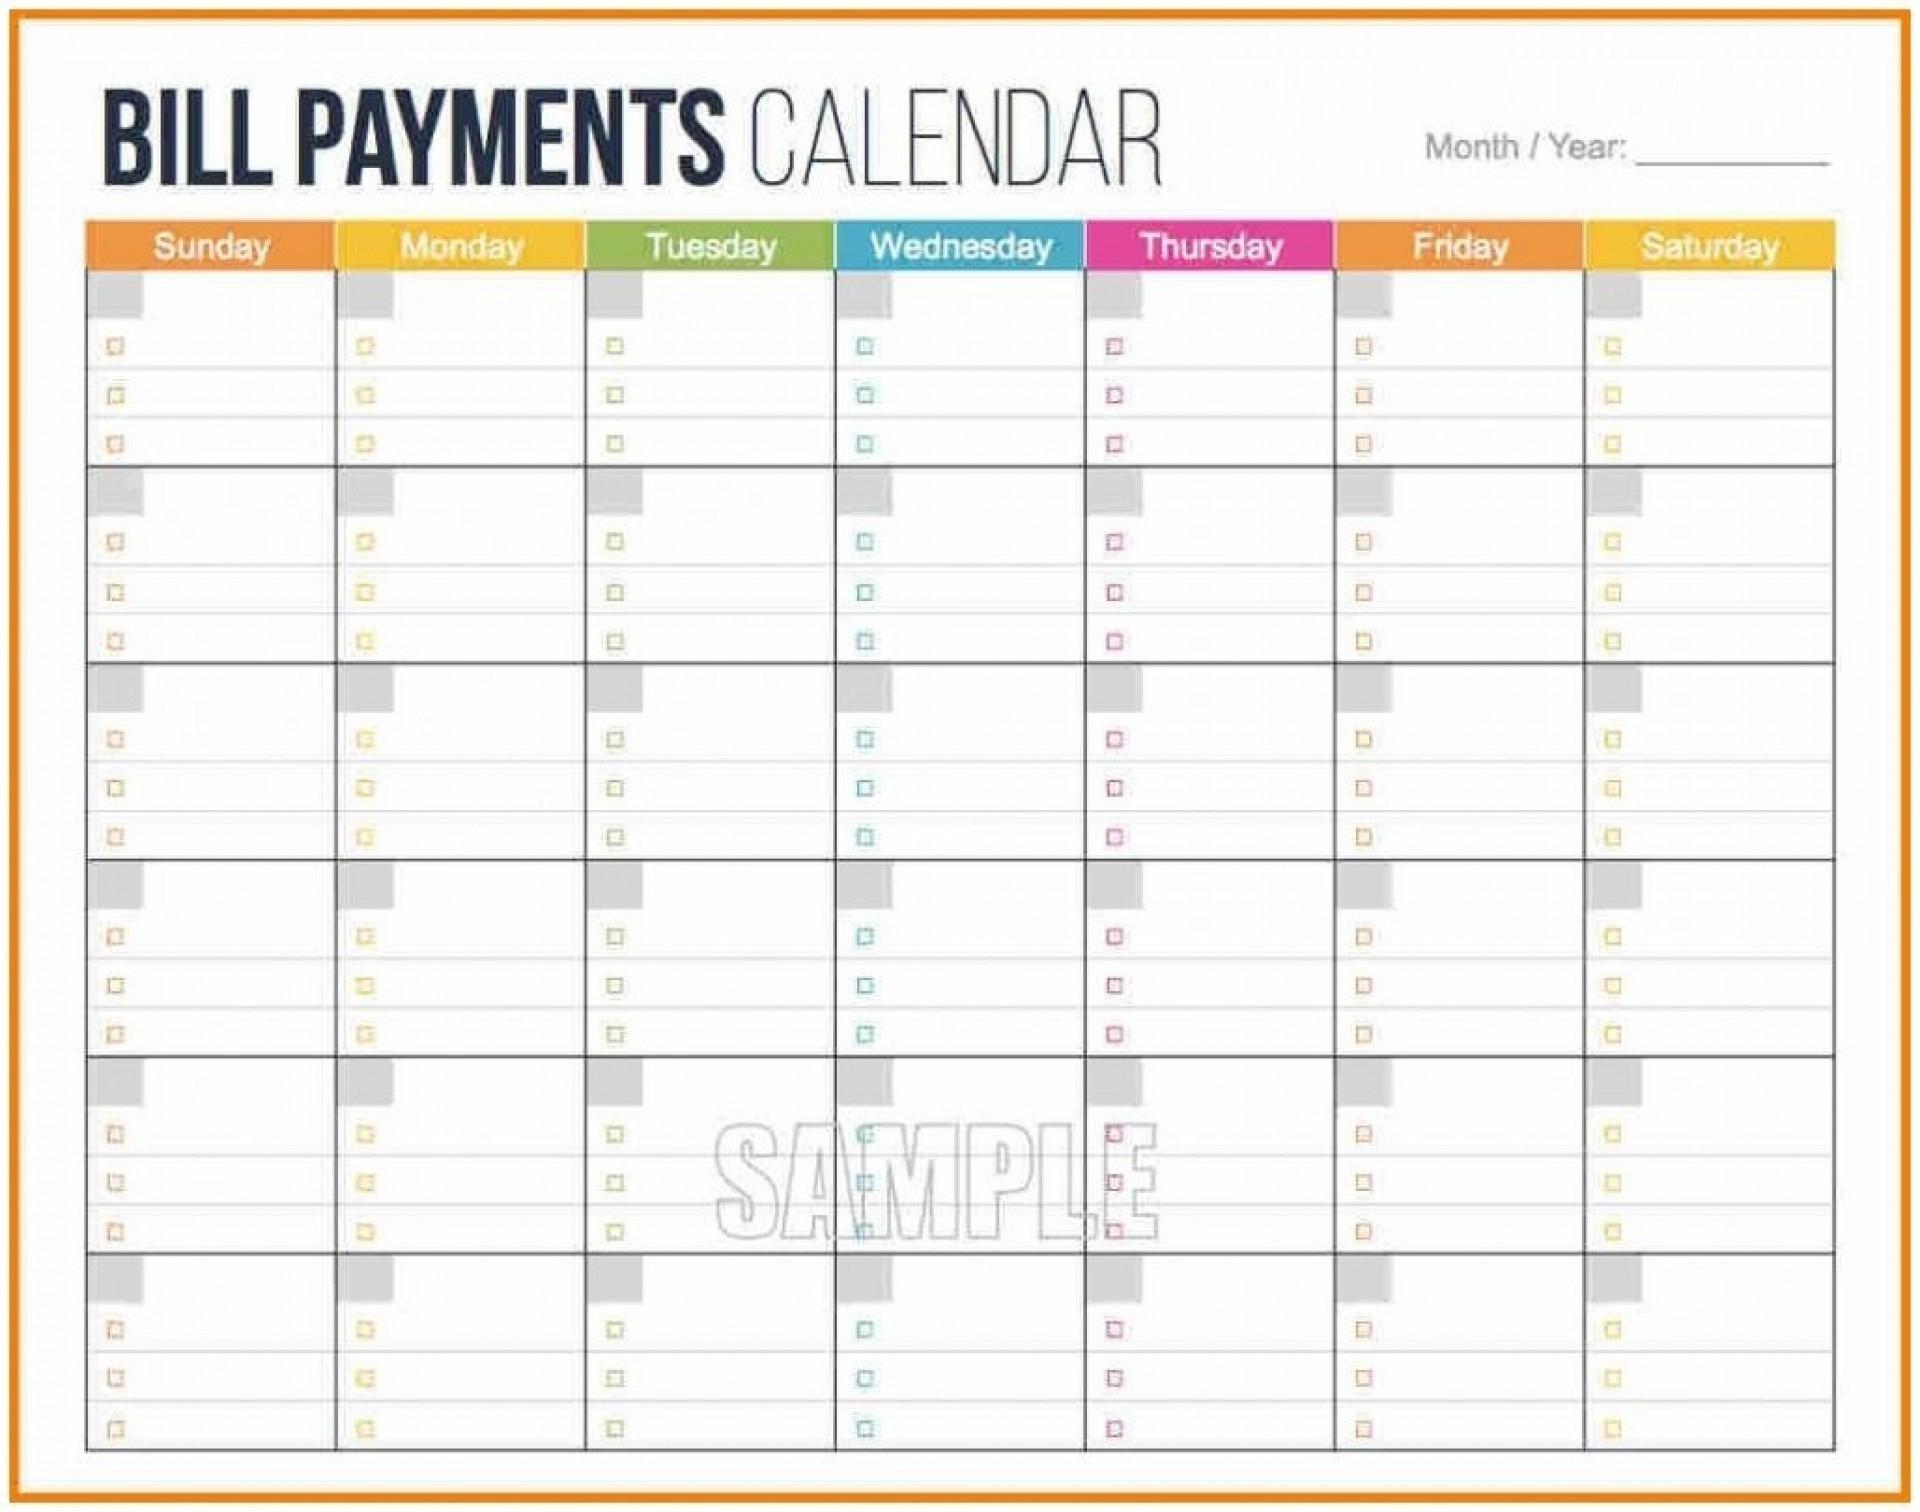 003 Bill Pay Calendar Template Ideas Paying Free Printable-Bill Pay Calendar Template